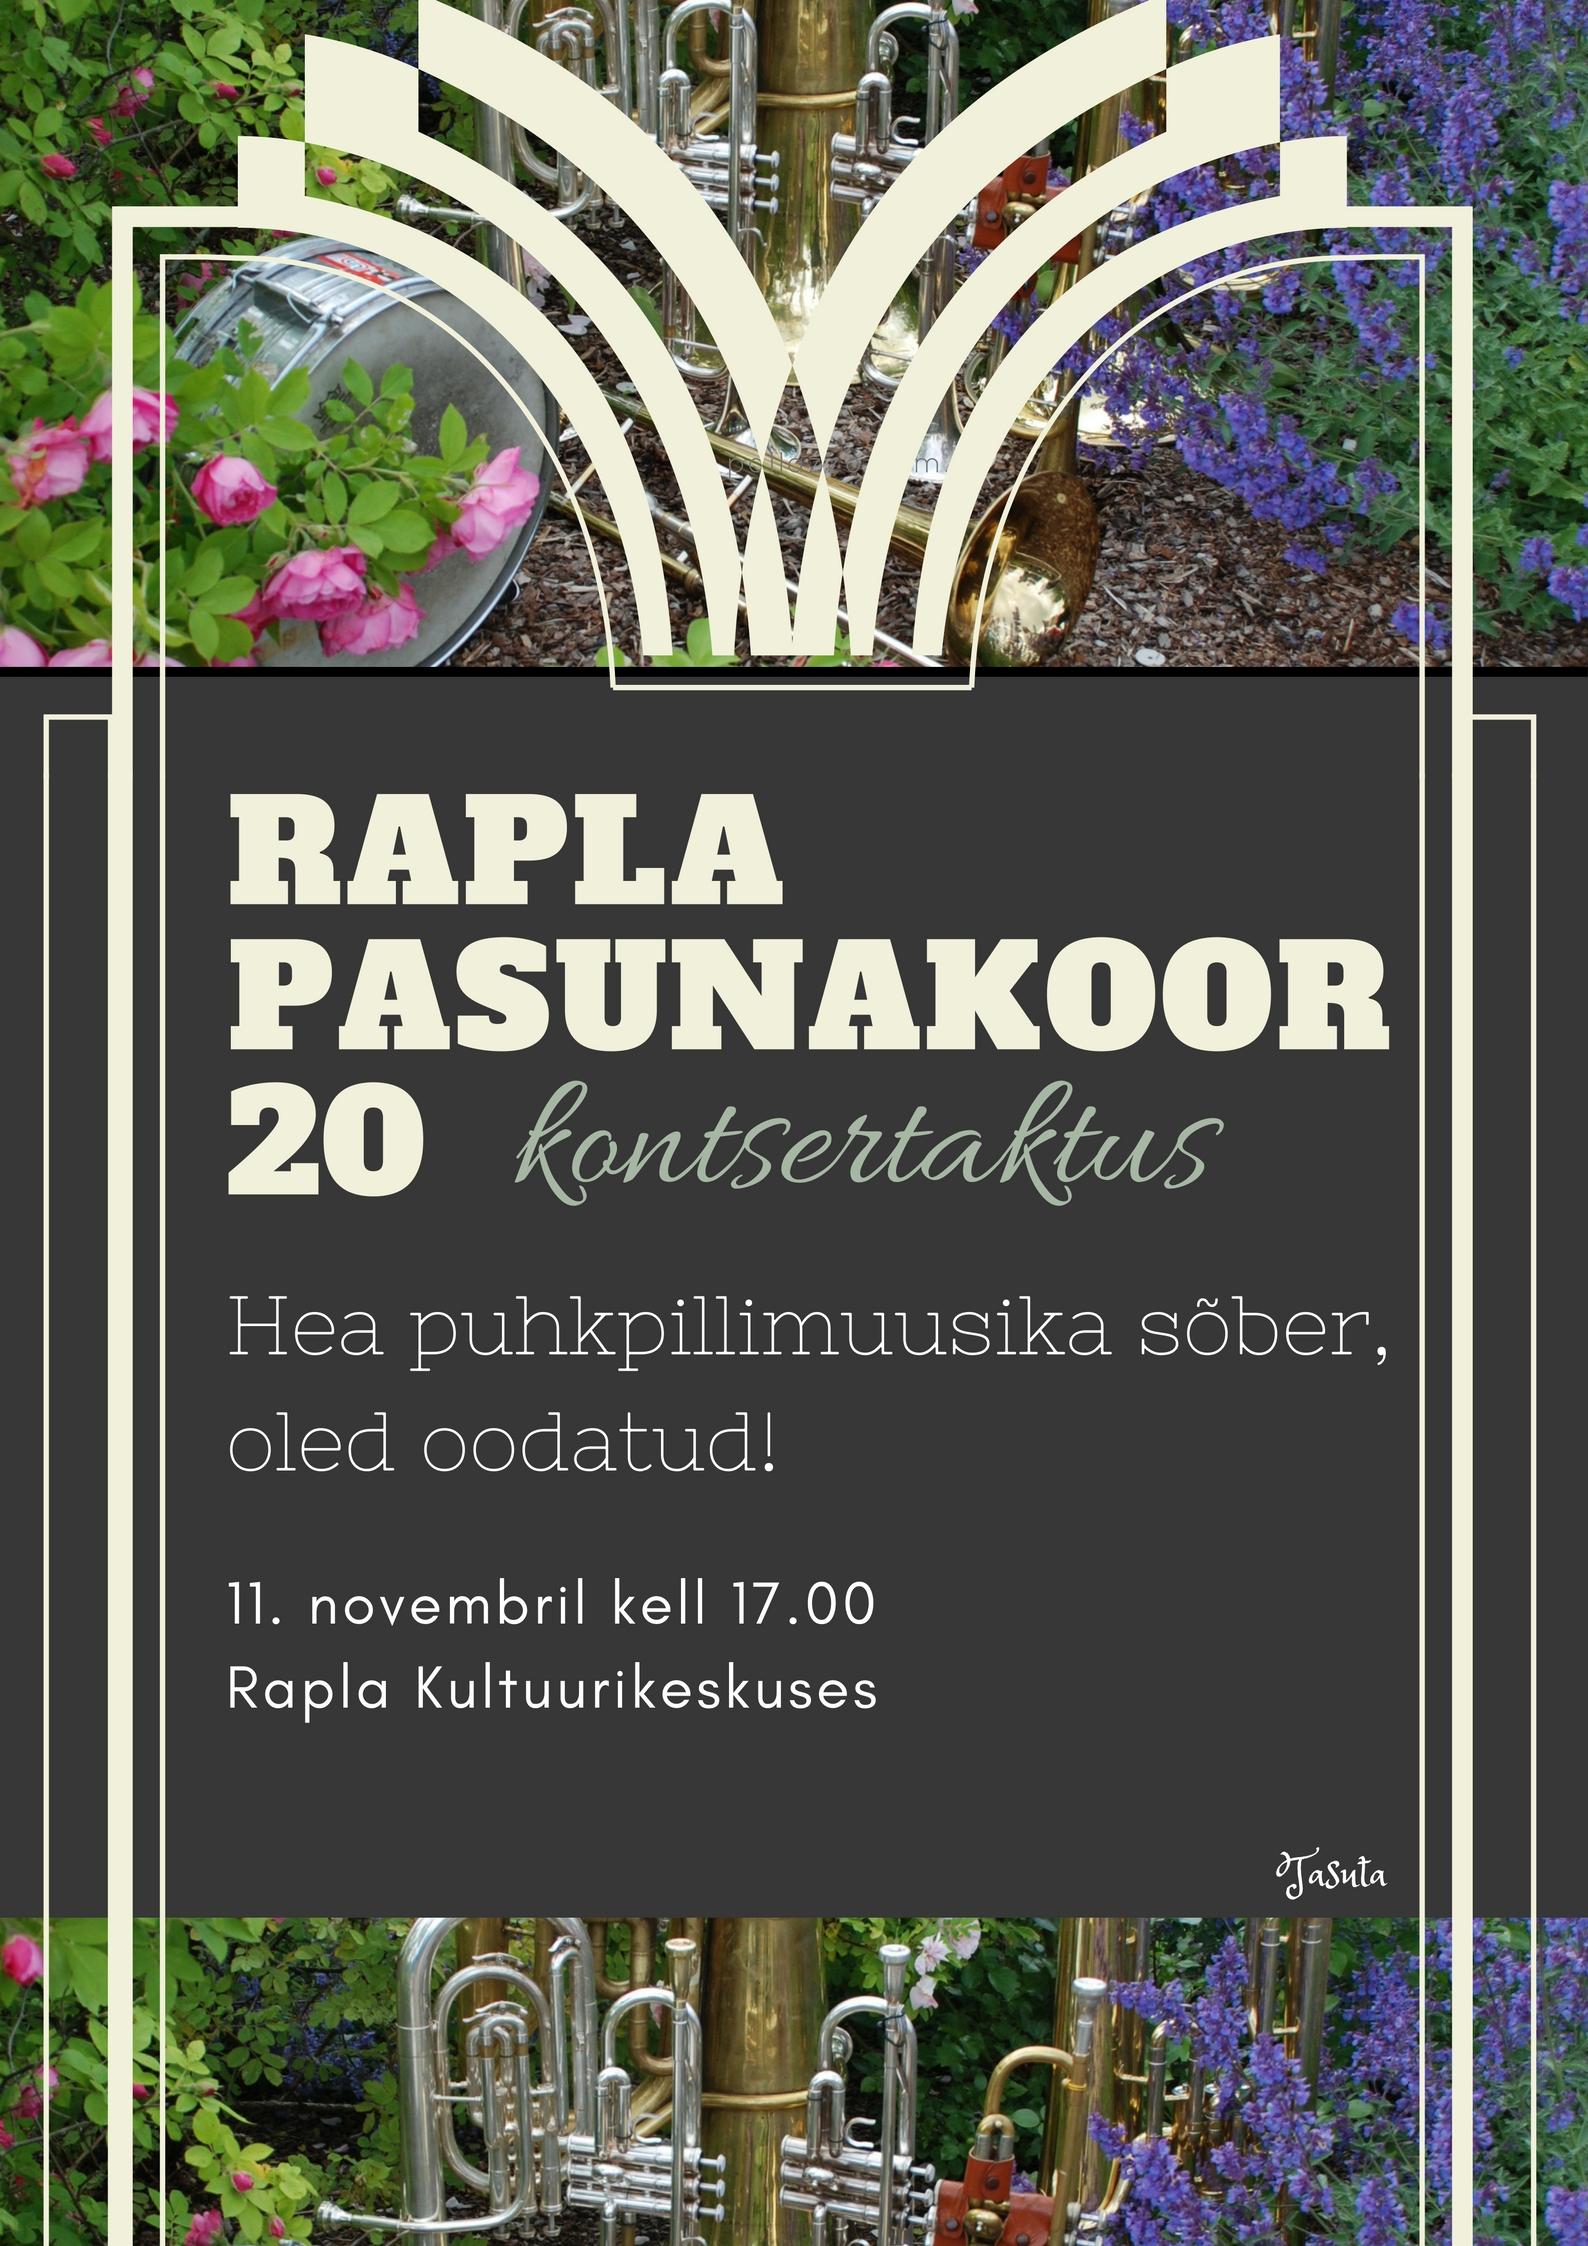 Rapla Pasunakoor 20